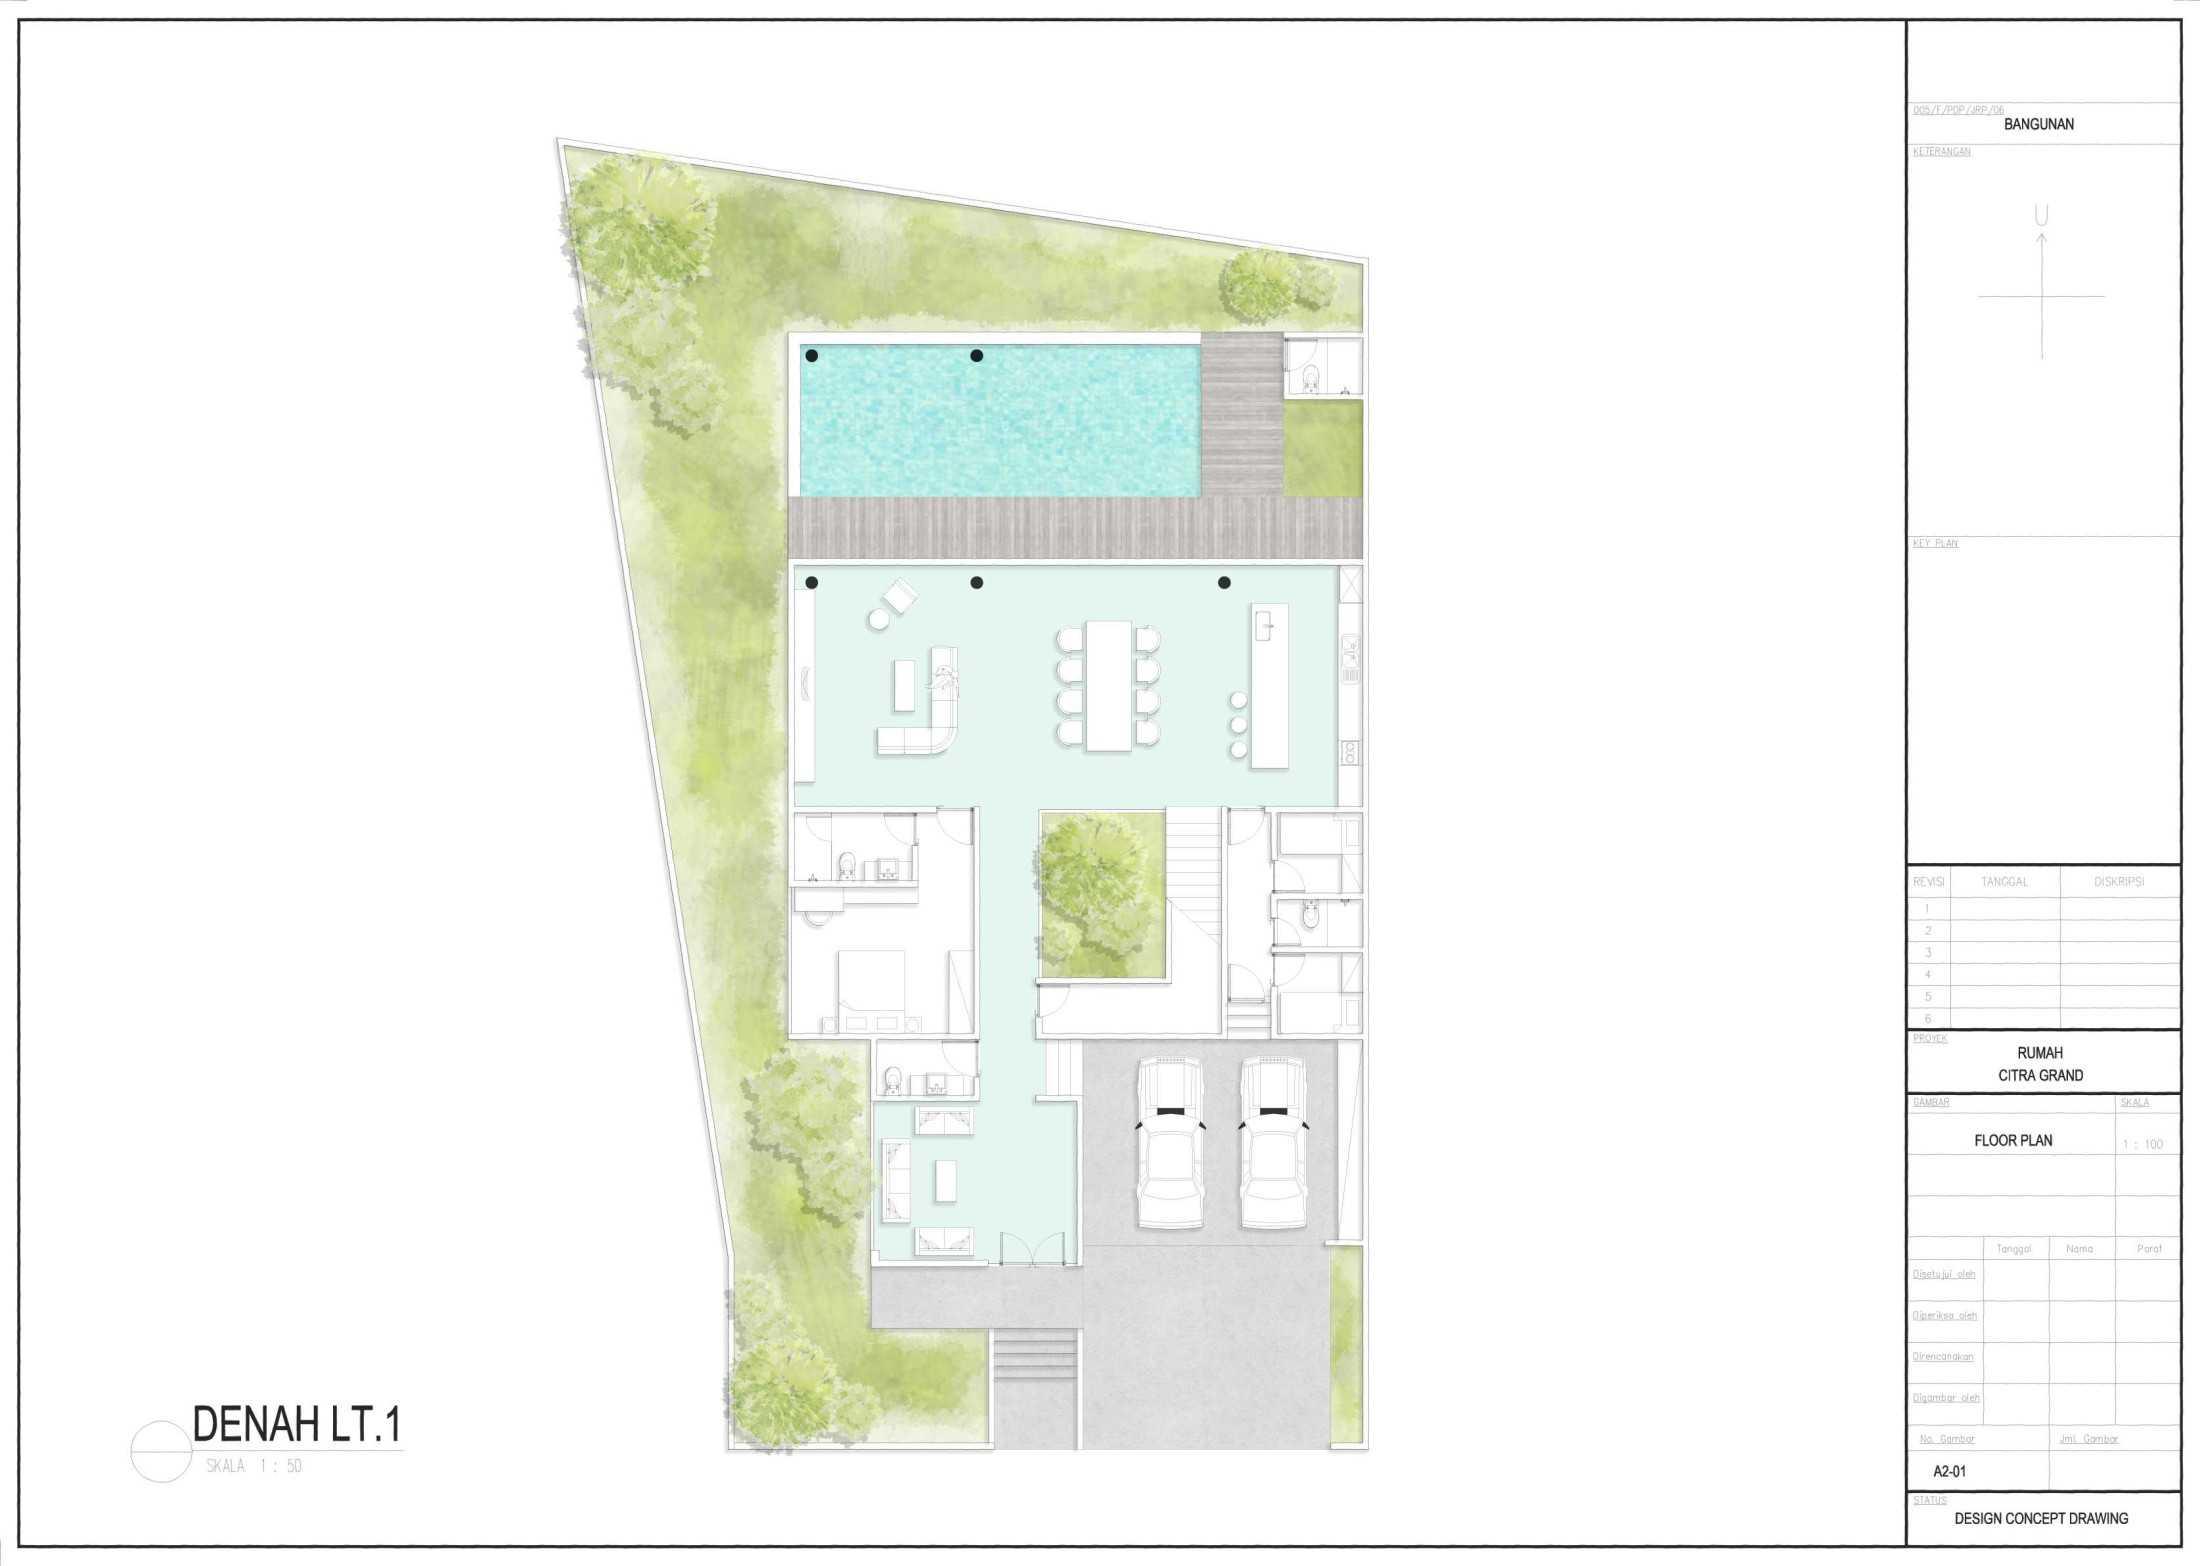 Mahastudio & Partner Italic House, Cibubur Jatisampurna, Kota Bks, Jawa Barat, Indonesia Jatisampurna, Kota Bks, Jawa Barat, Indonesia Mahastudio-Partner-Italic-House-Cibubur  65449